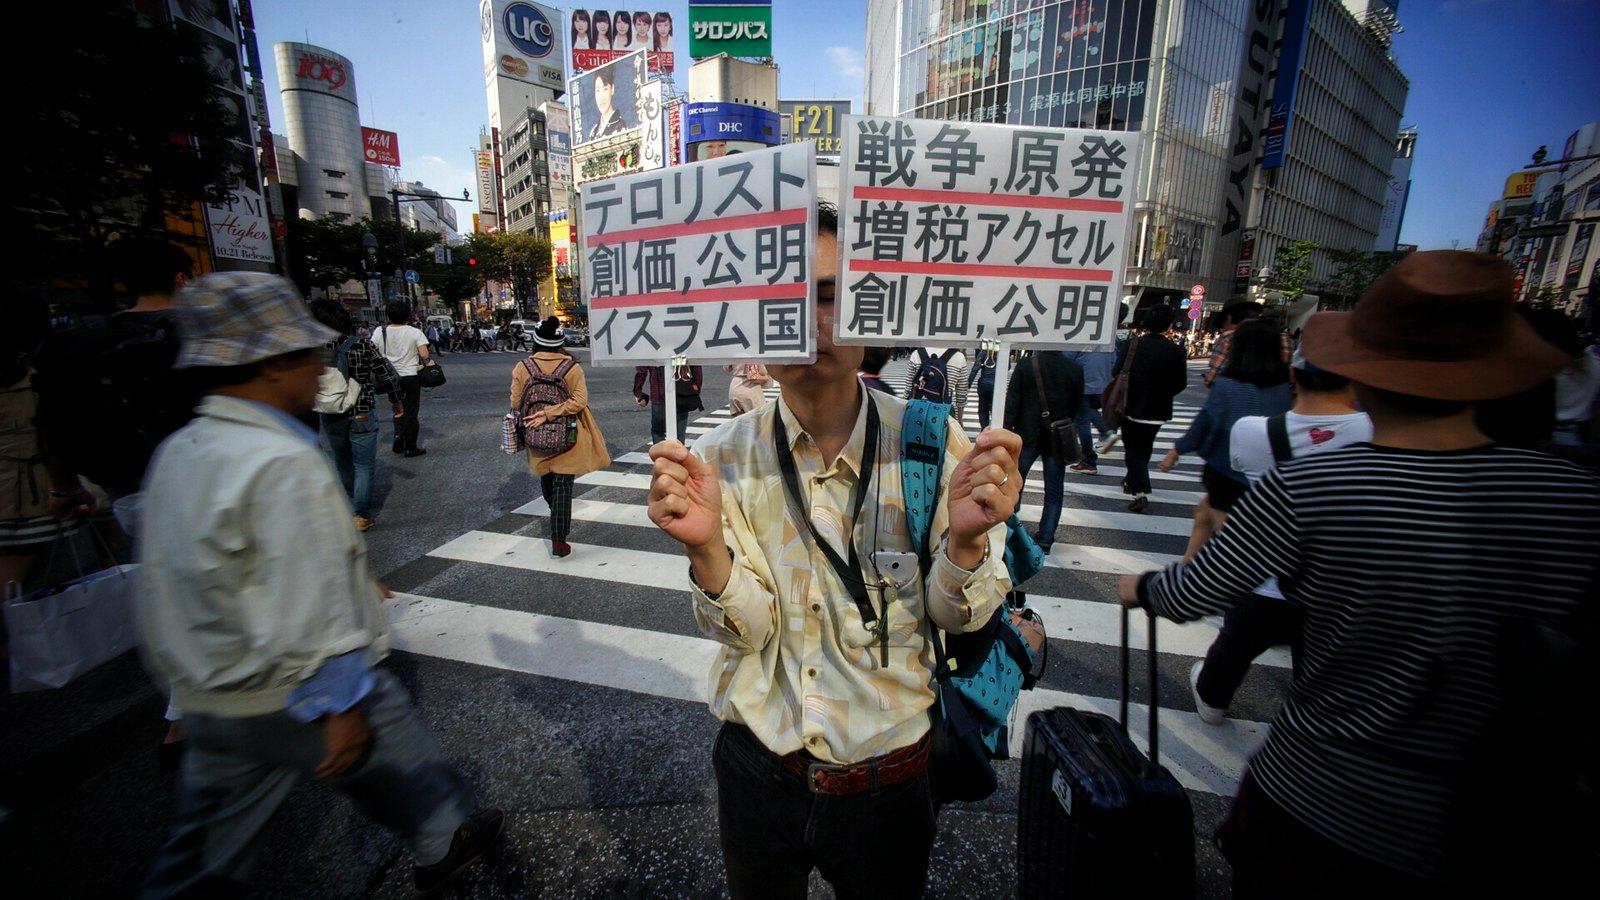 Man with a Message #shibuya #tokyo #japan15 #SonyA7 #Voigtlander12mm